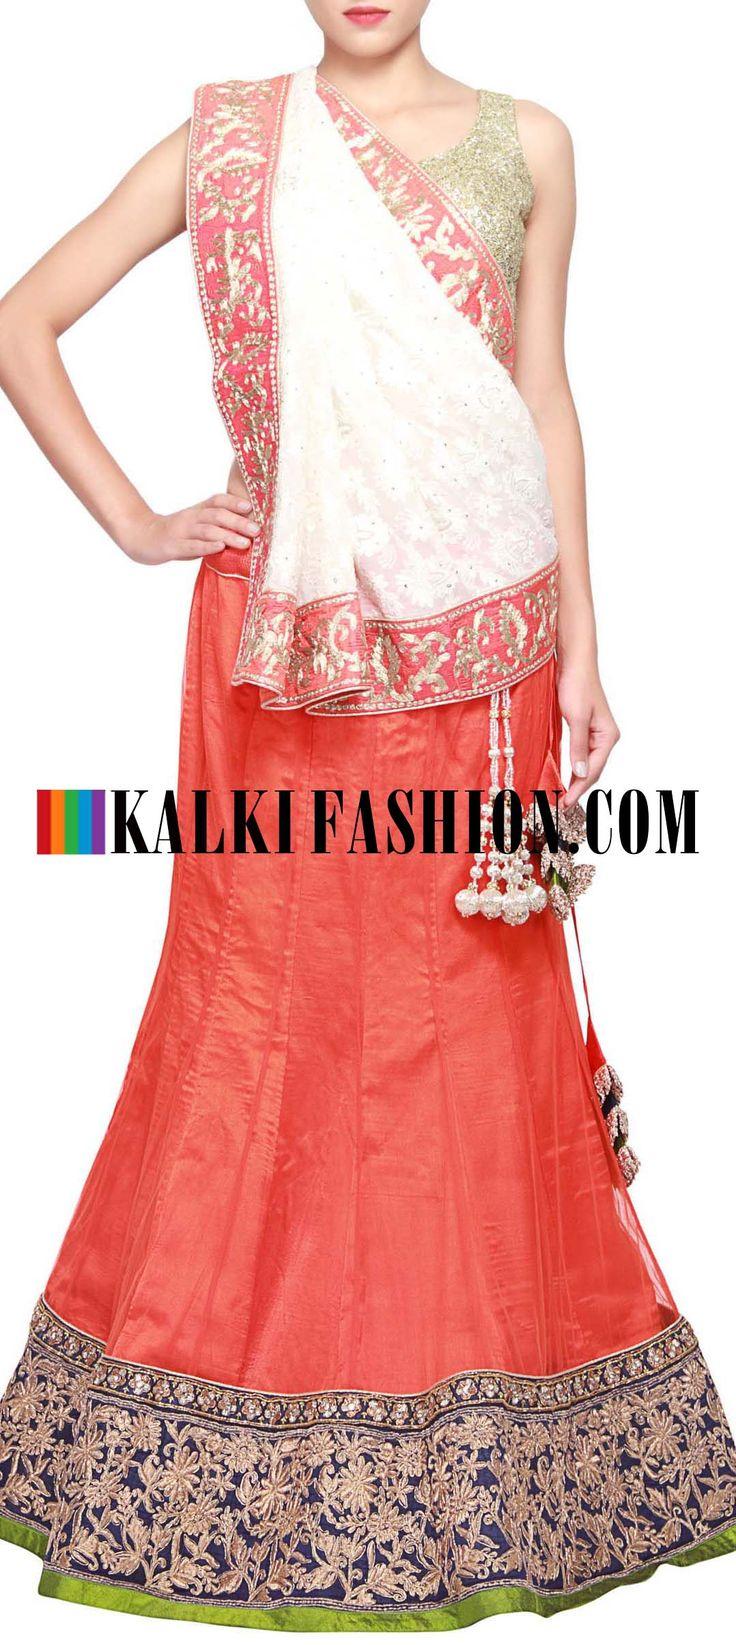 Get this beautiful lehenga here: http://www.kalkifashion.com/orange-net-lehenga-embellished-in-lucknowi-embroidery-only-on-kalki.html Free shipping worldwide.